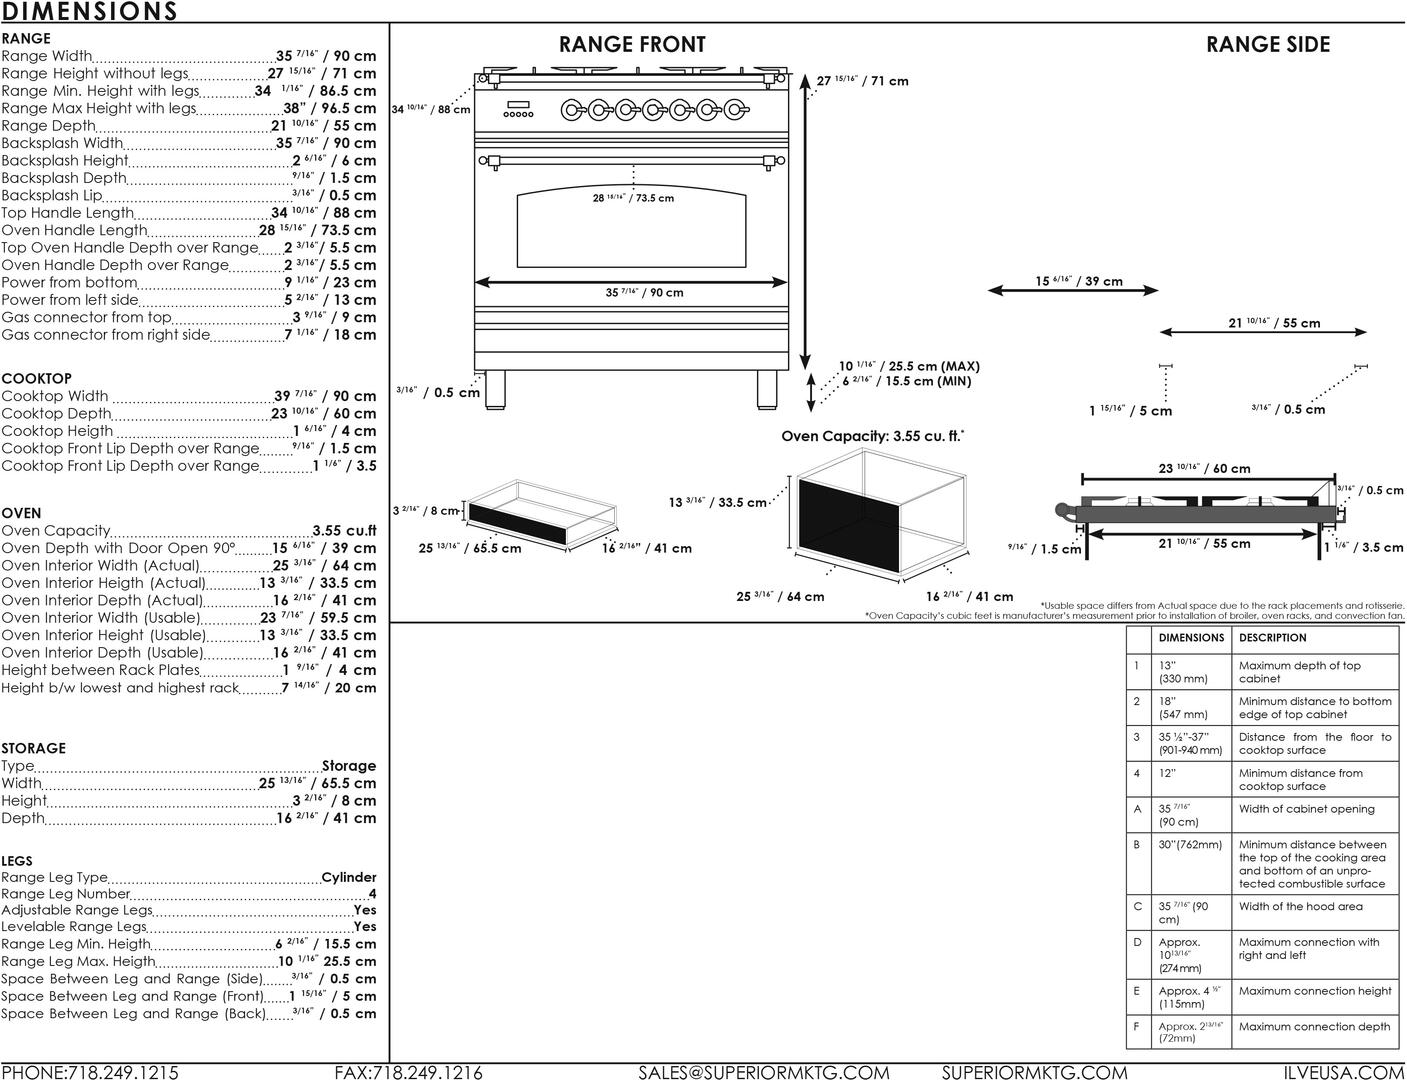 Ilve Nostalgie UPN90FDMPBL Freestanding Dual Fuel Range Blue, UPN90FDM Dimensions Guide